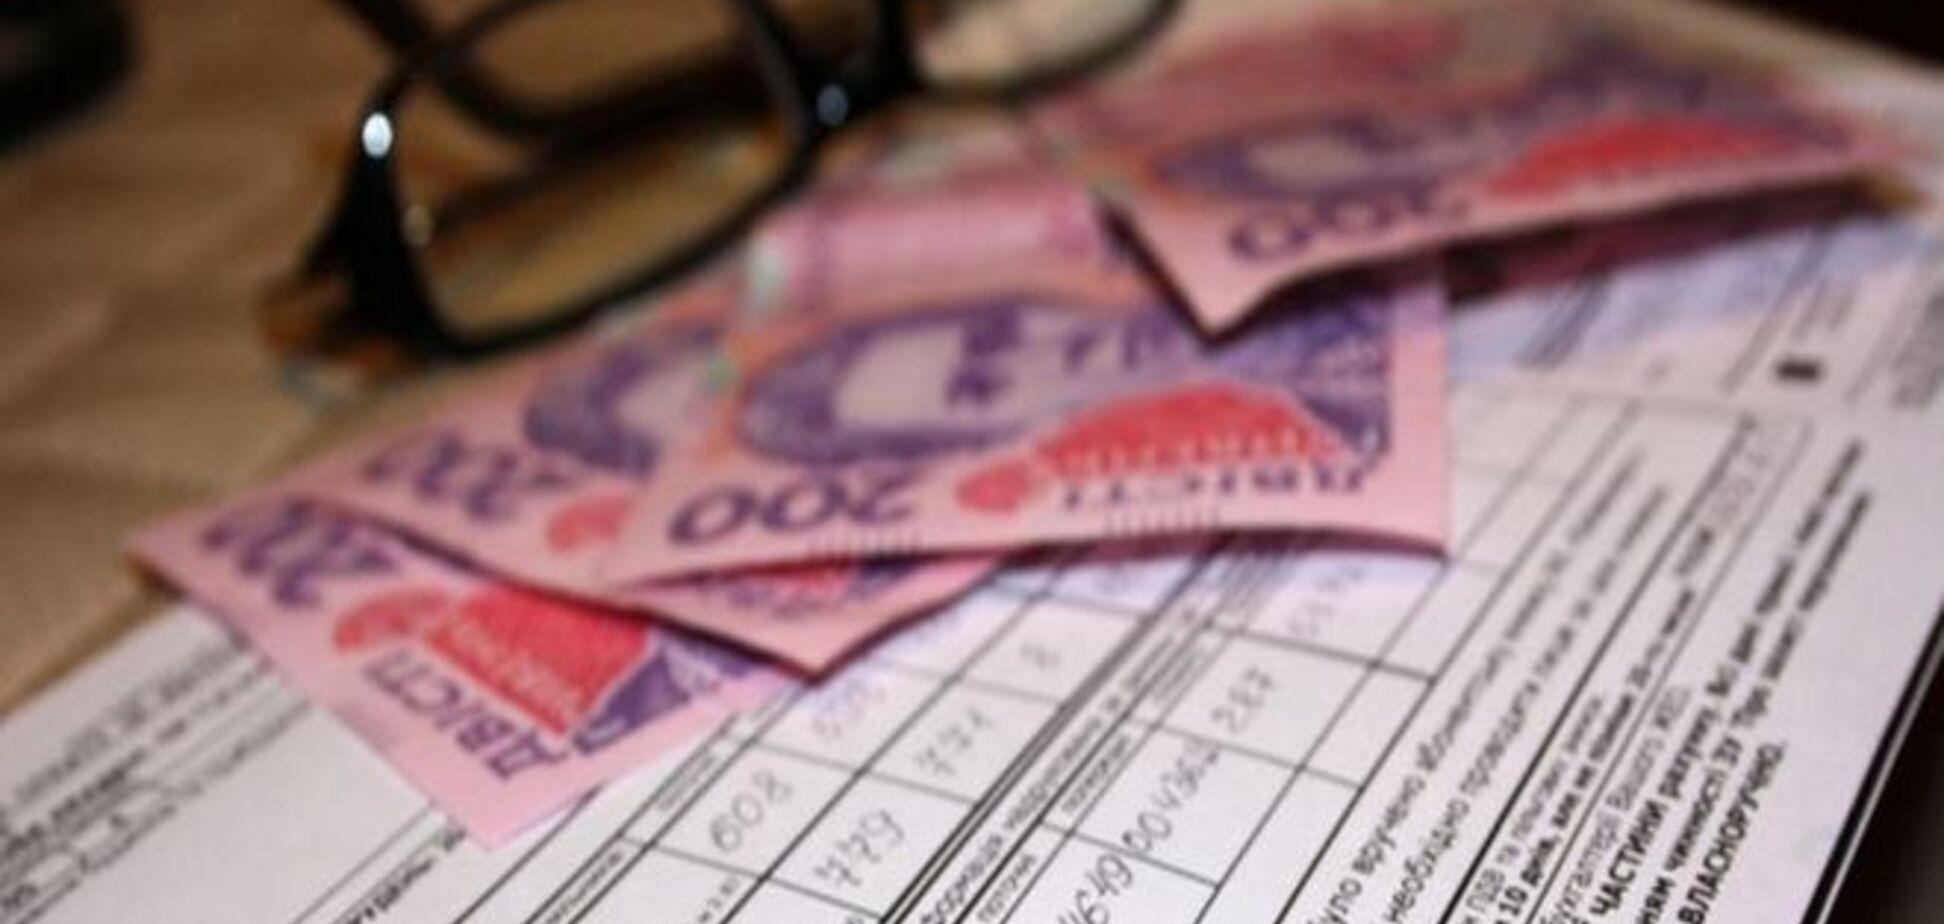 Акимова о дефолте: в Украине могут сократить субсидии